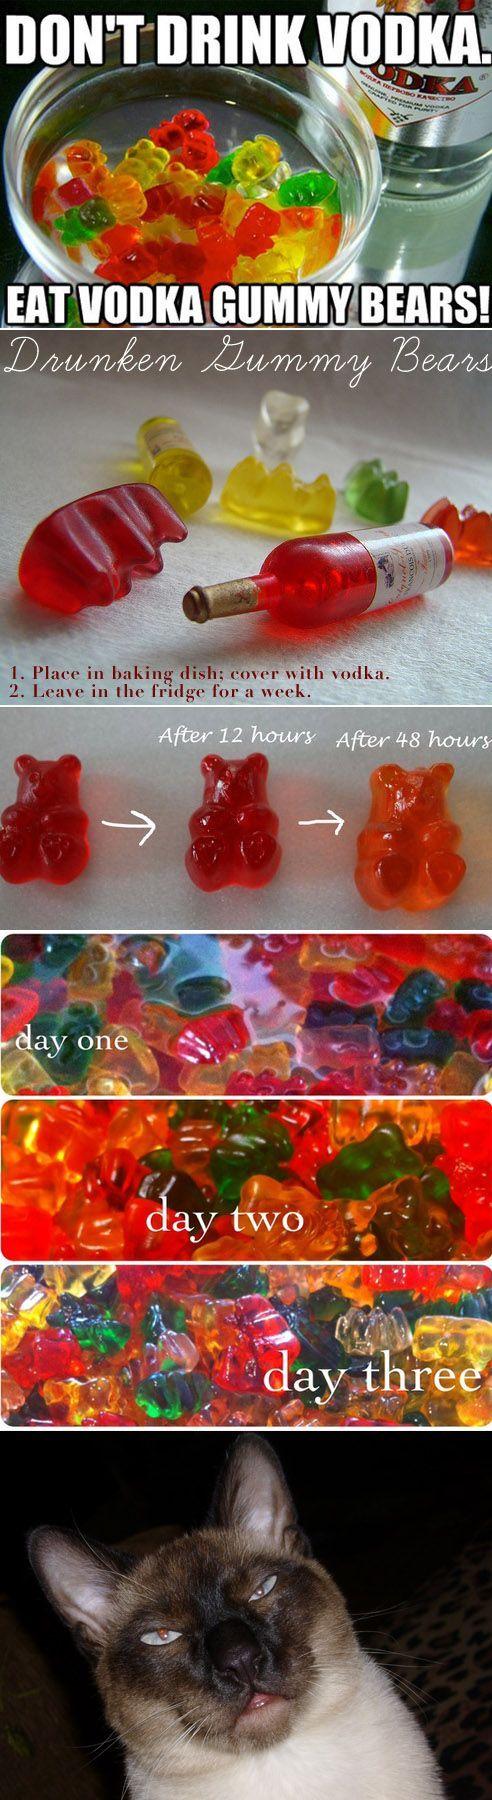 44 Reasons Why Your Life Will Be So Much Easier In 2013 Vodka Gummy Bears Fun Drinks Drunken Gummy Bears